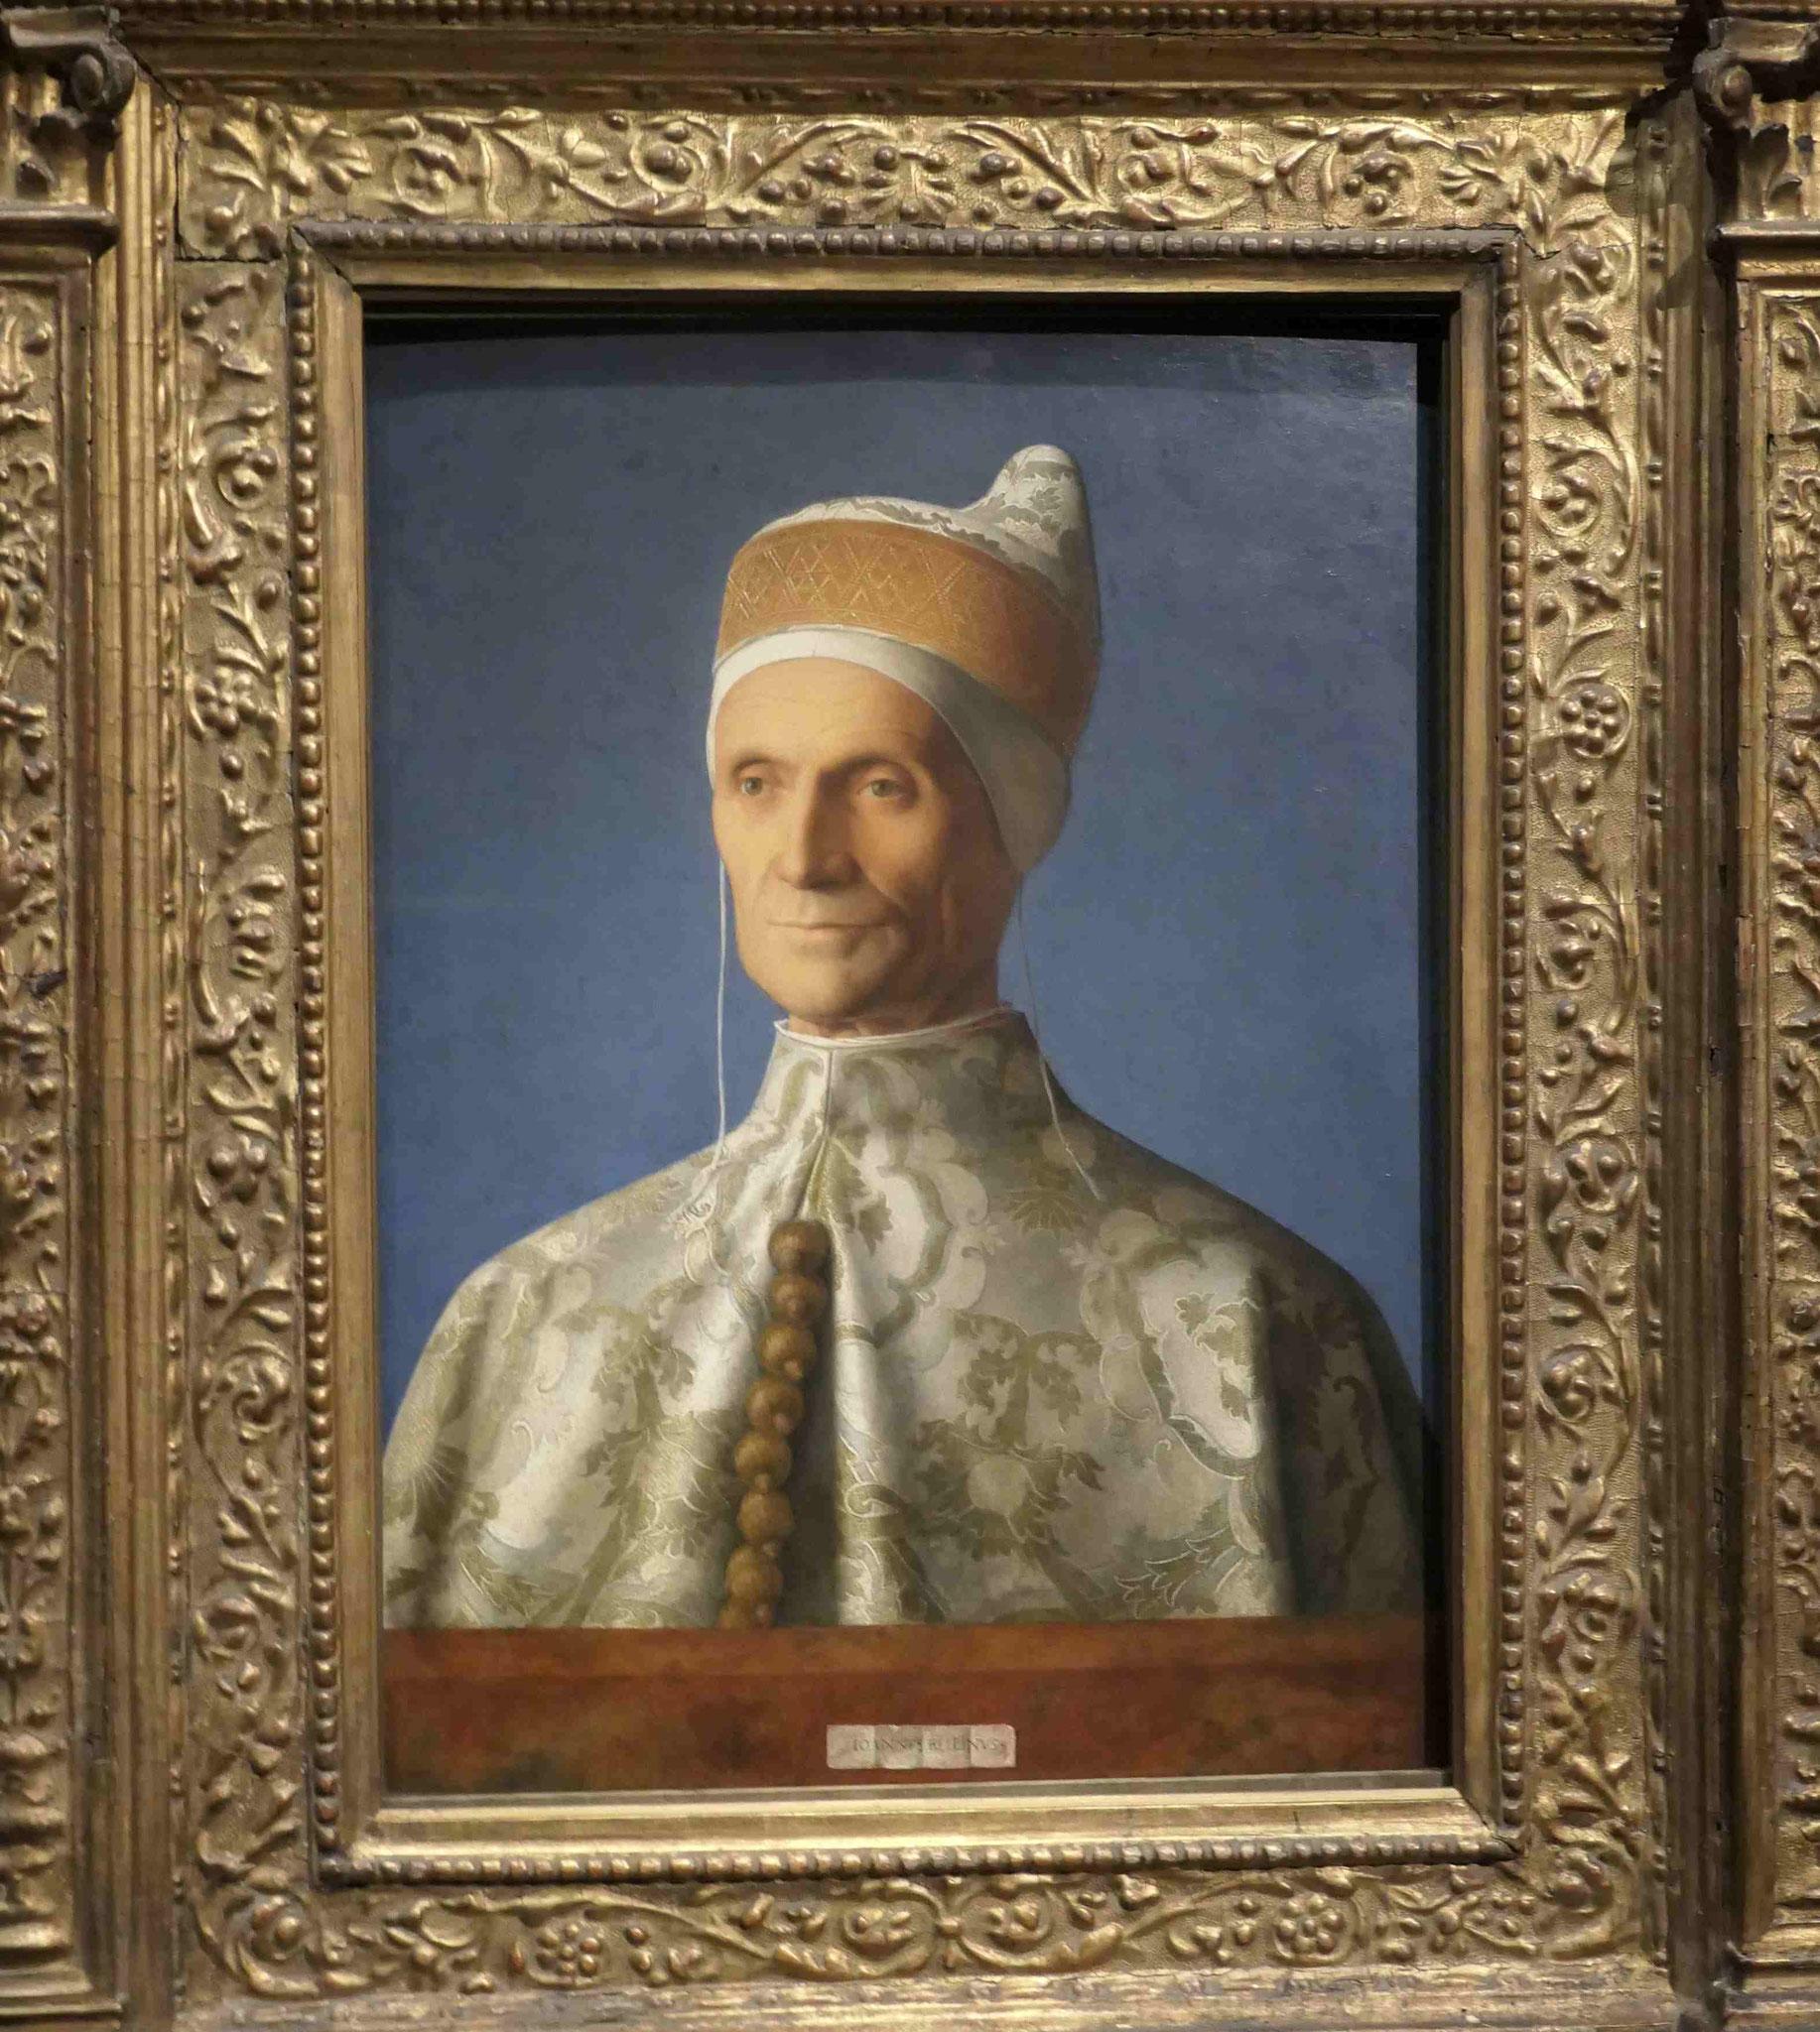 Giovanni Bellini, Der Doge Leonardo Loredan um 1501/02